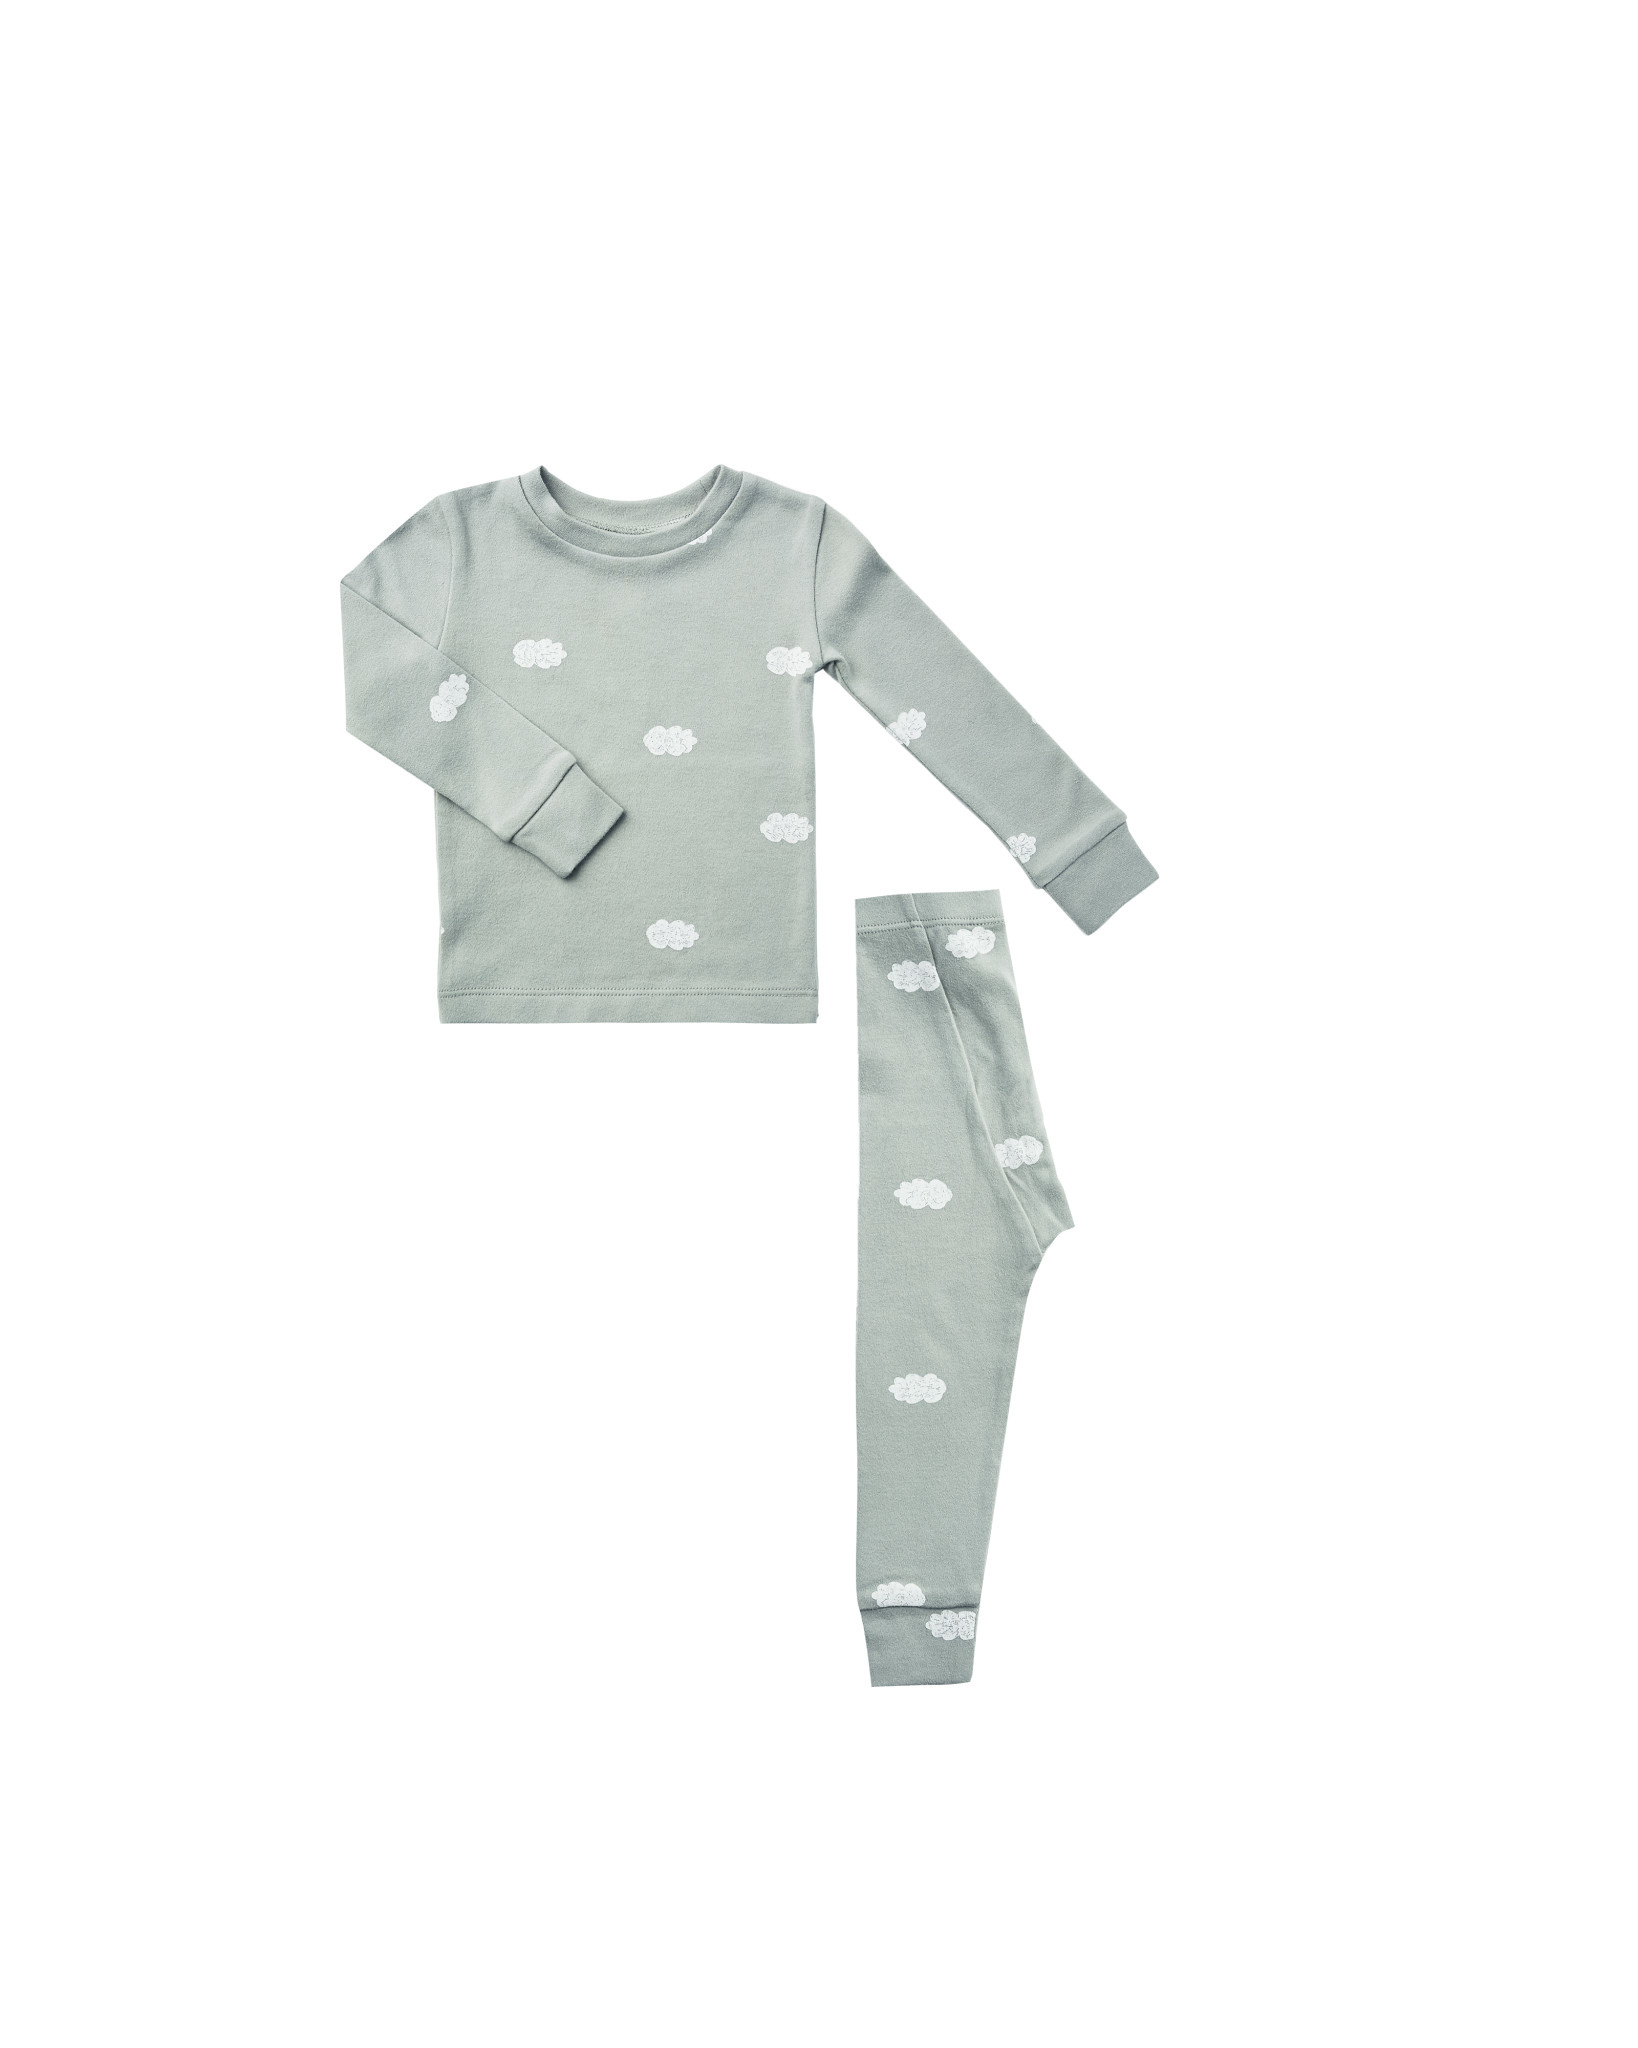 RYLEE AND CRU Clouds Pajama Set